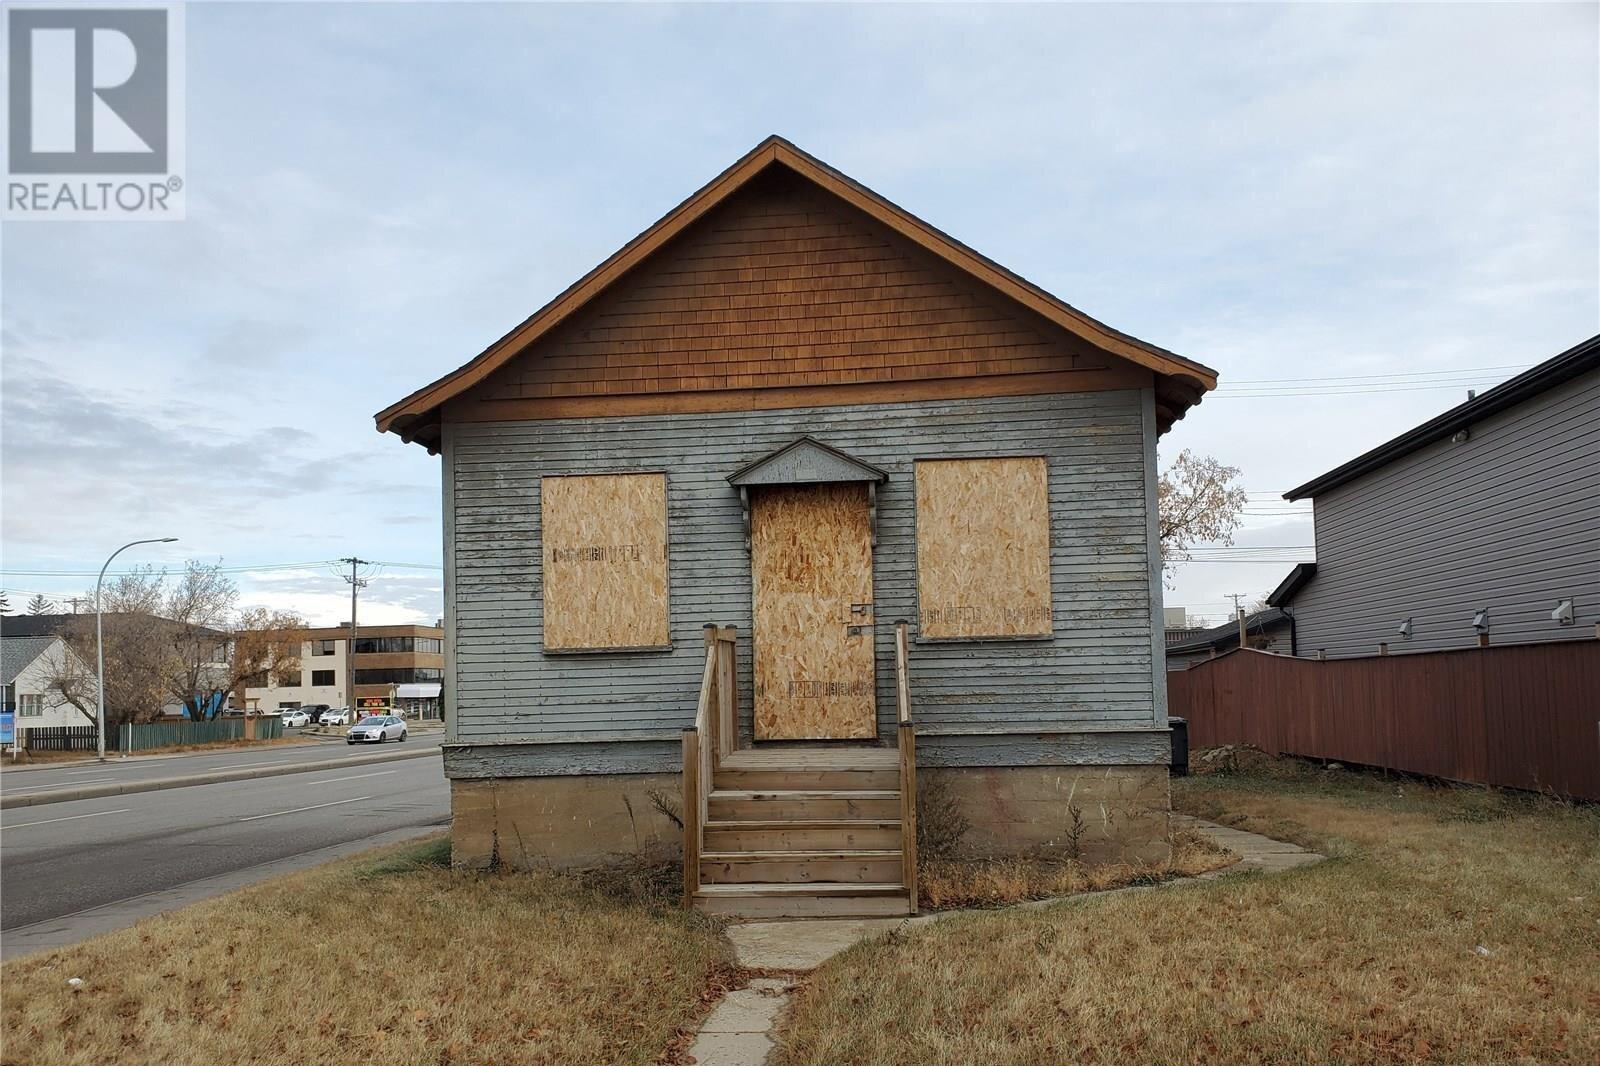 House for sale at 102 M Ave S Saskatoon Saskatchewan - MLS: SK831724